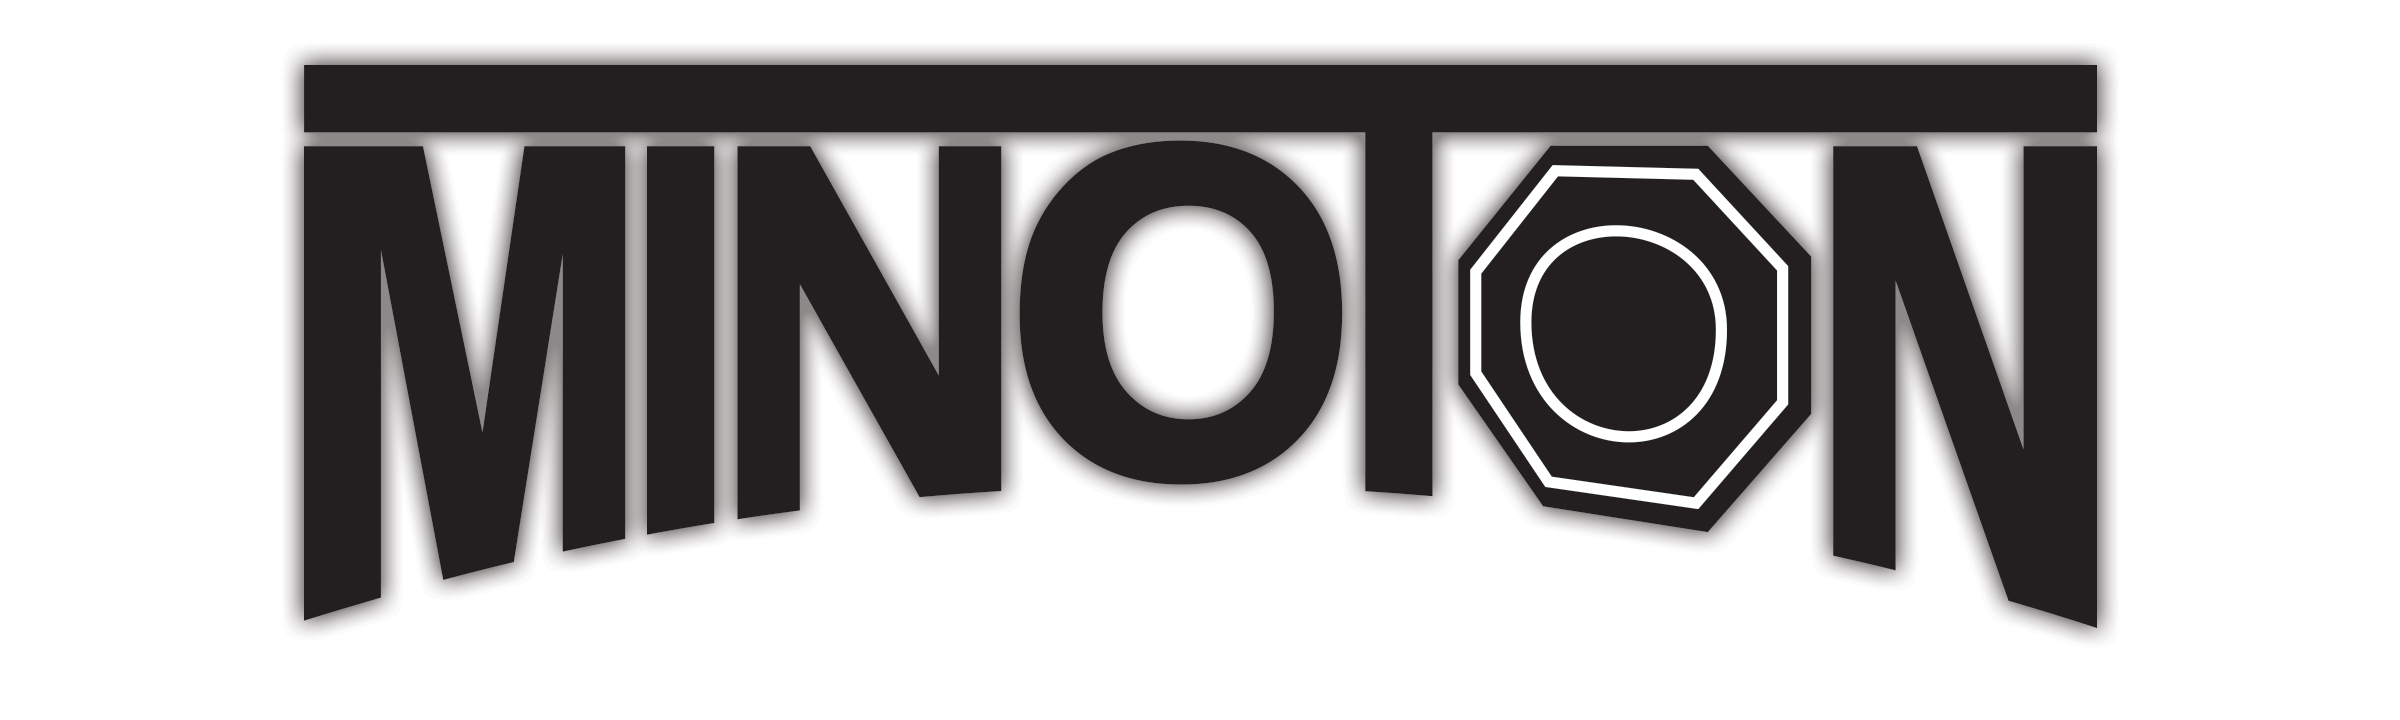 Minoton Logo